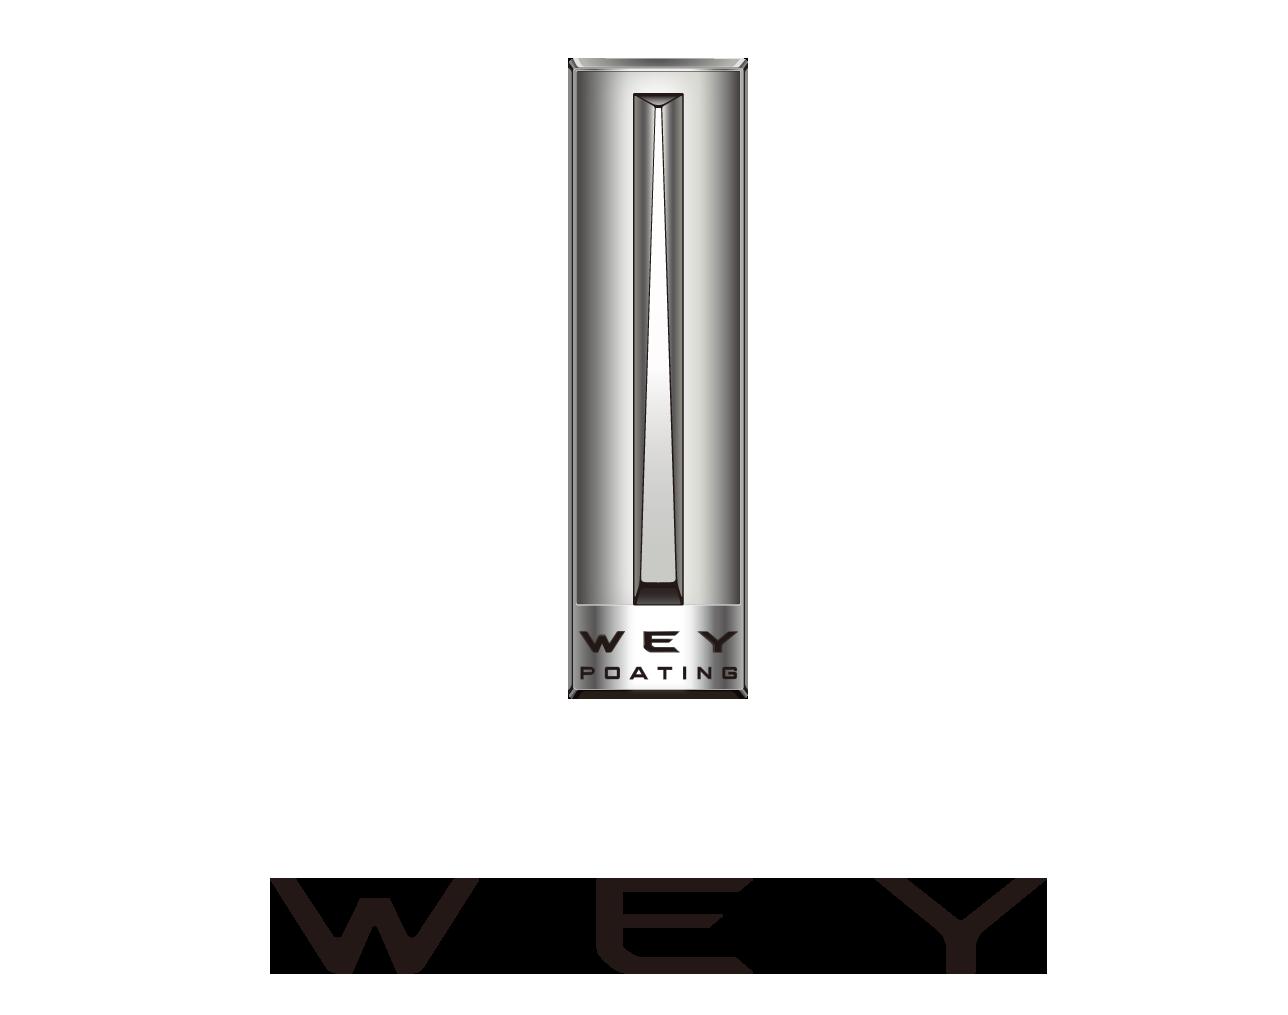 3.国家品牌计划 WEY-1.png